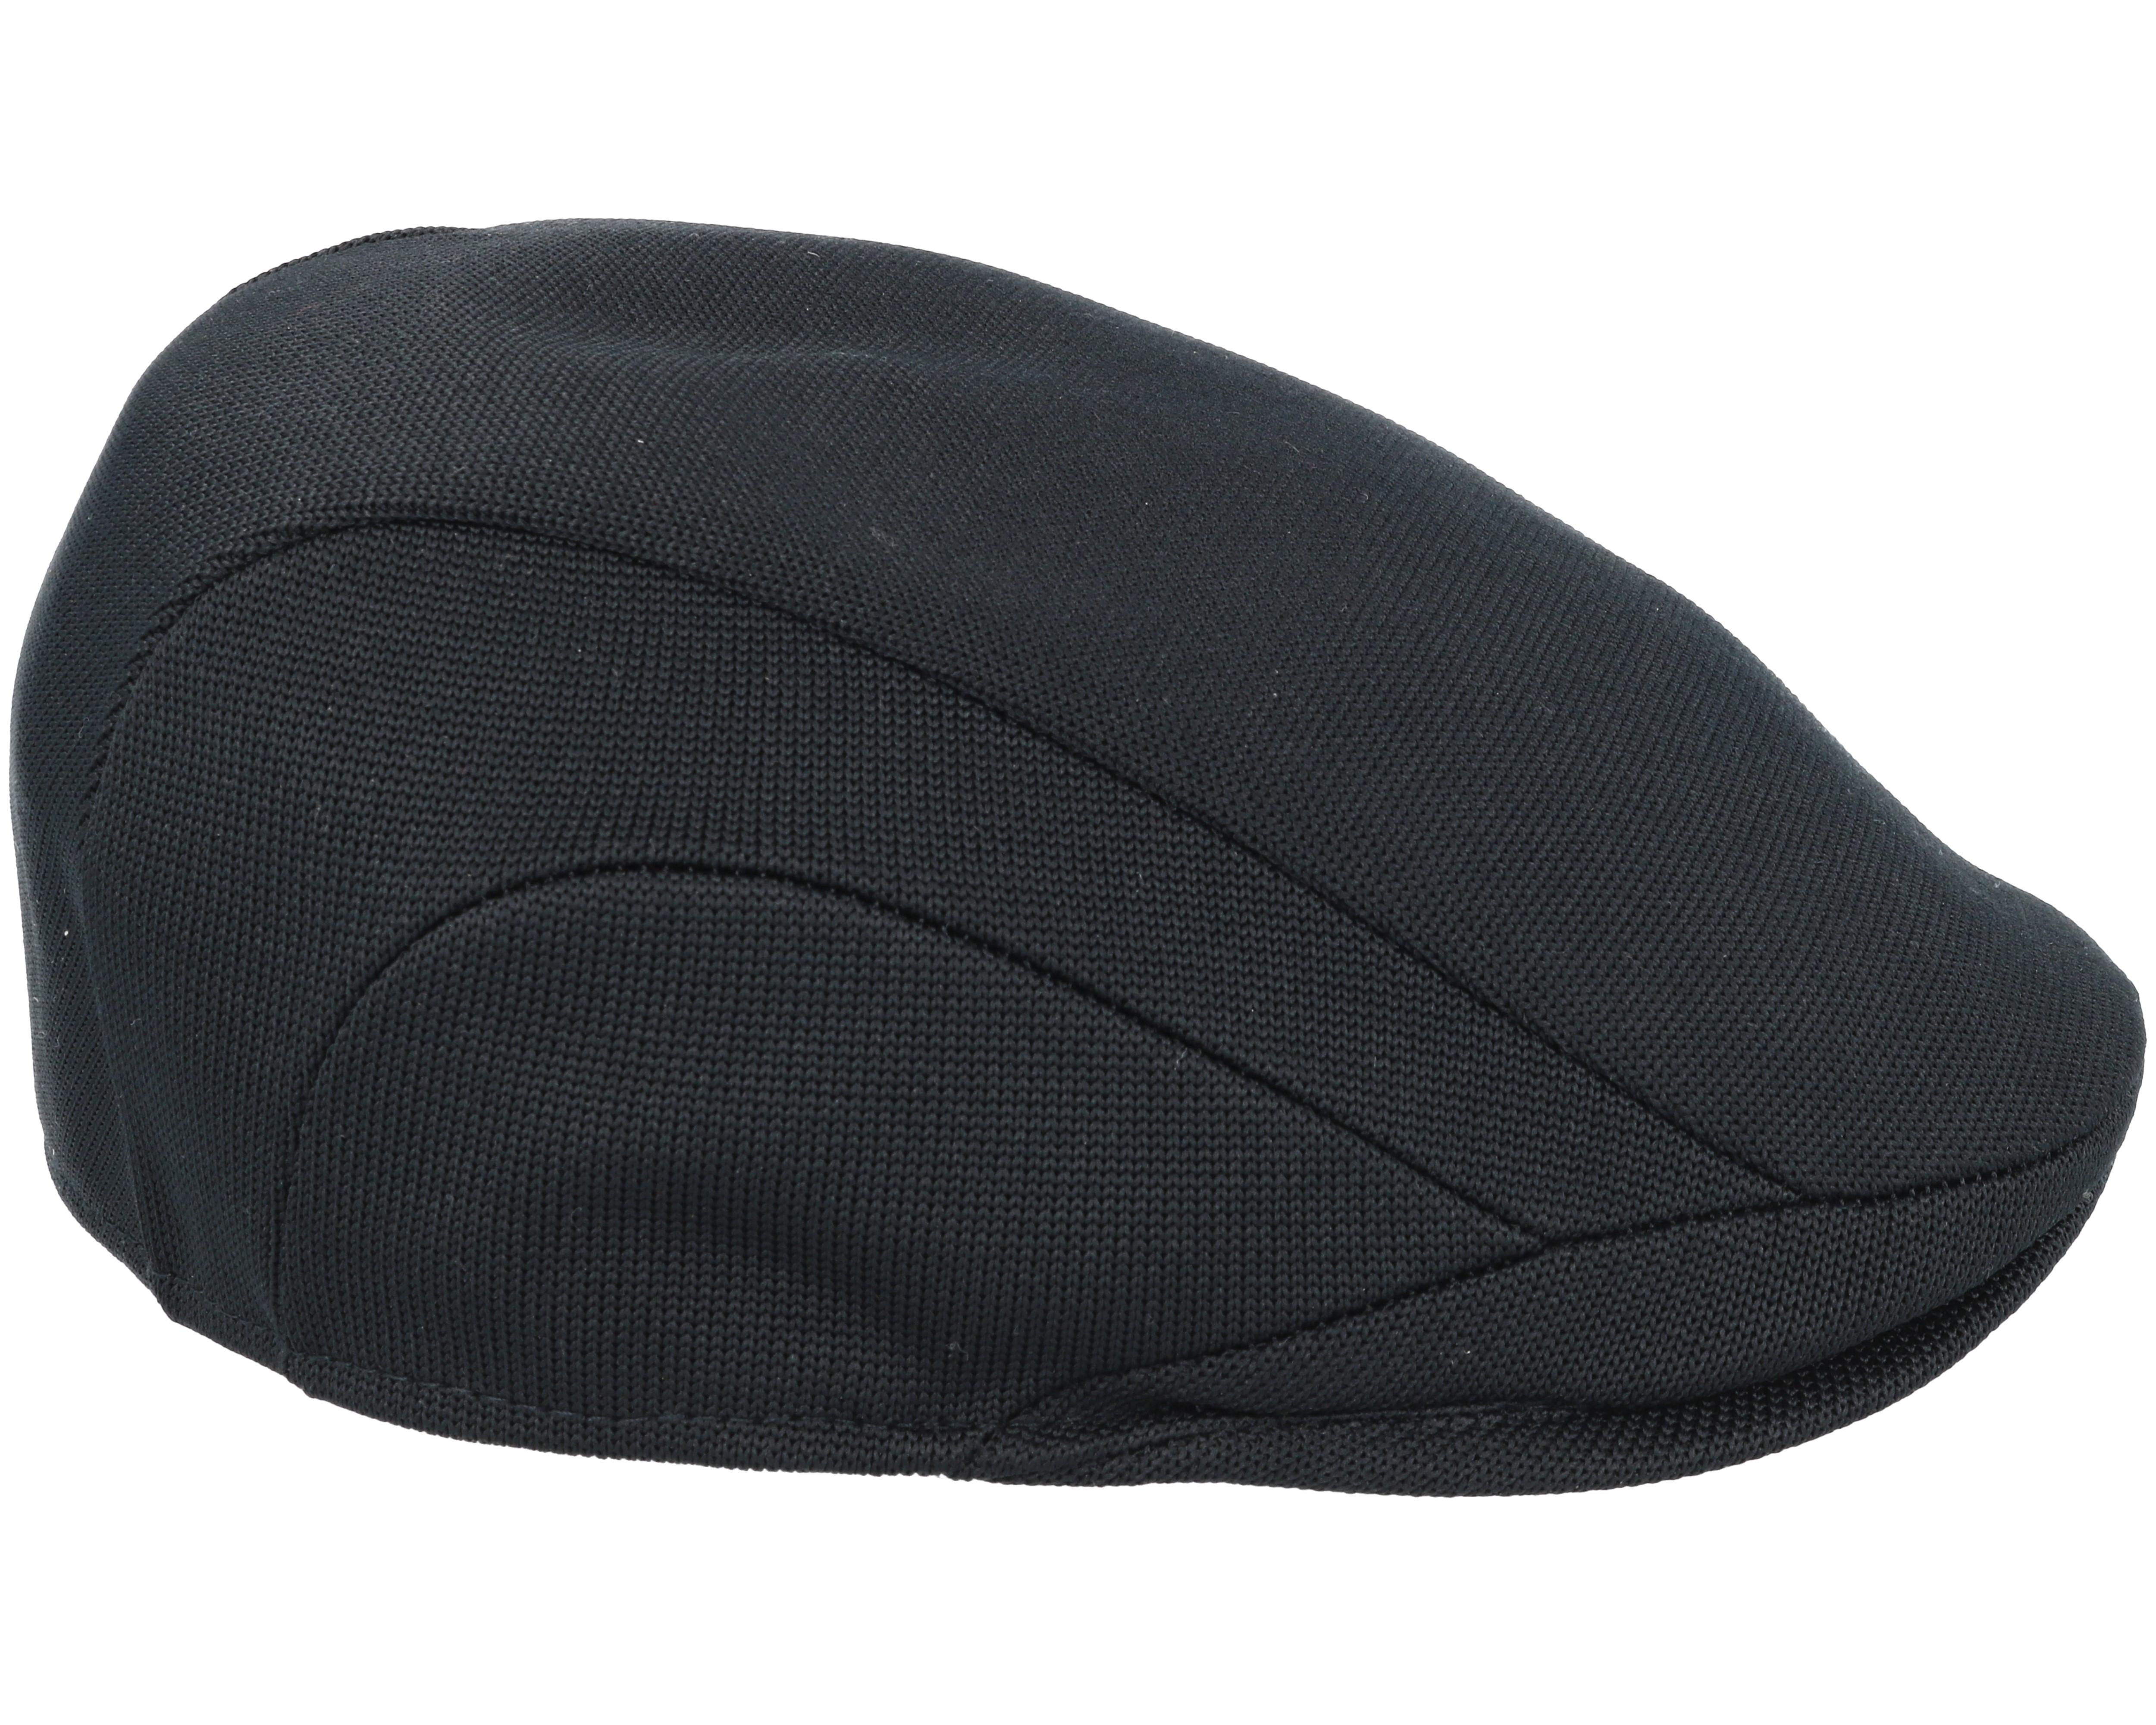 Tropic 507 Black Flat Cap - Kangol Keps